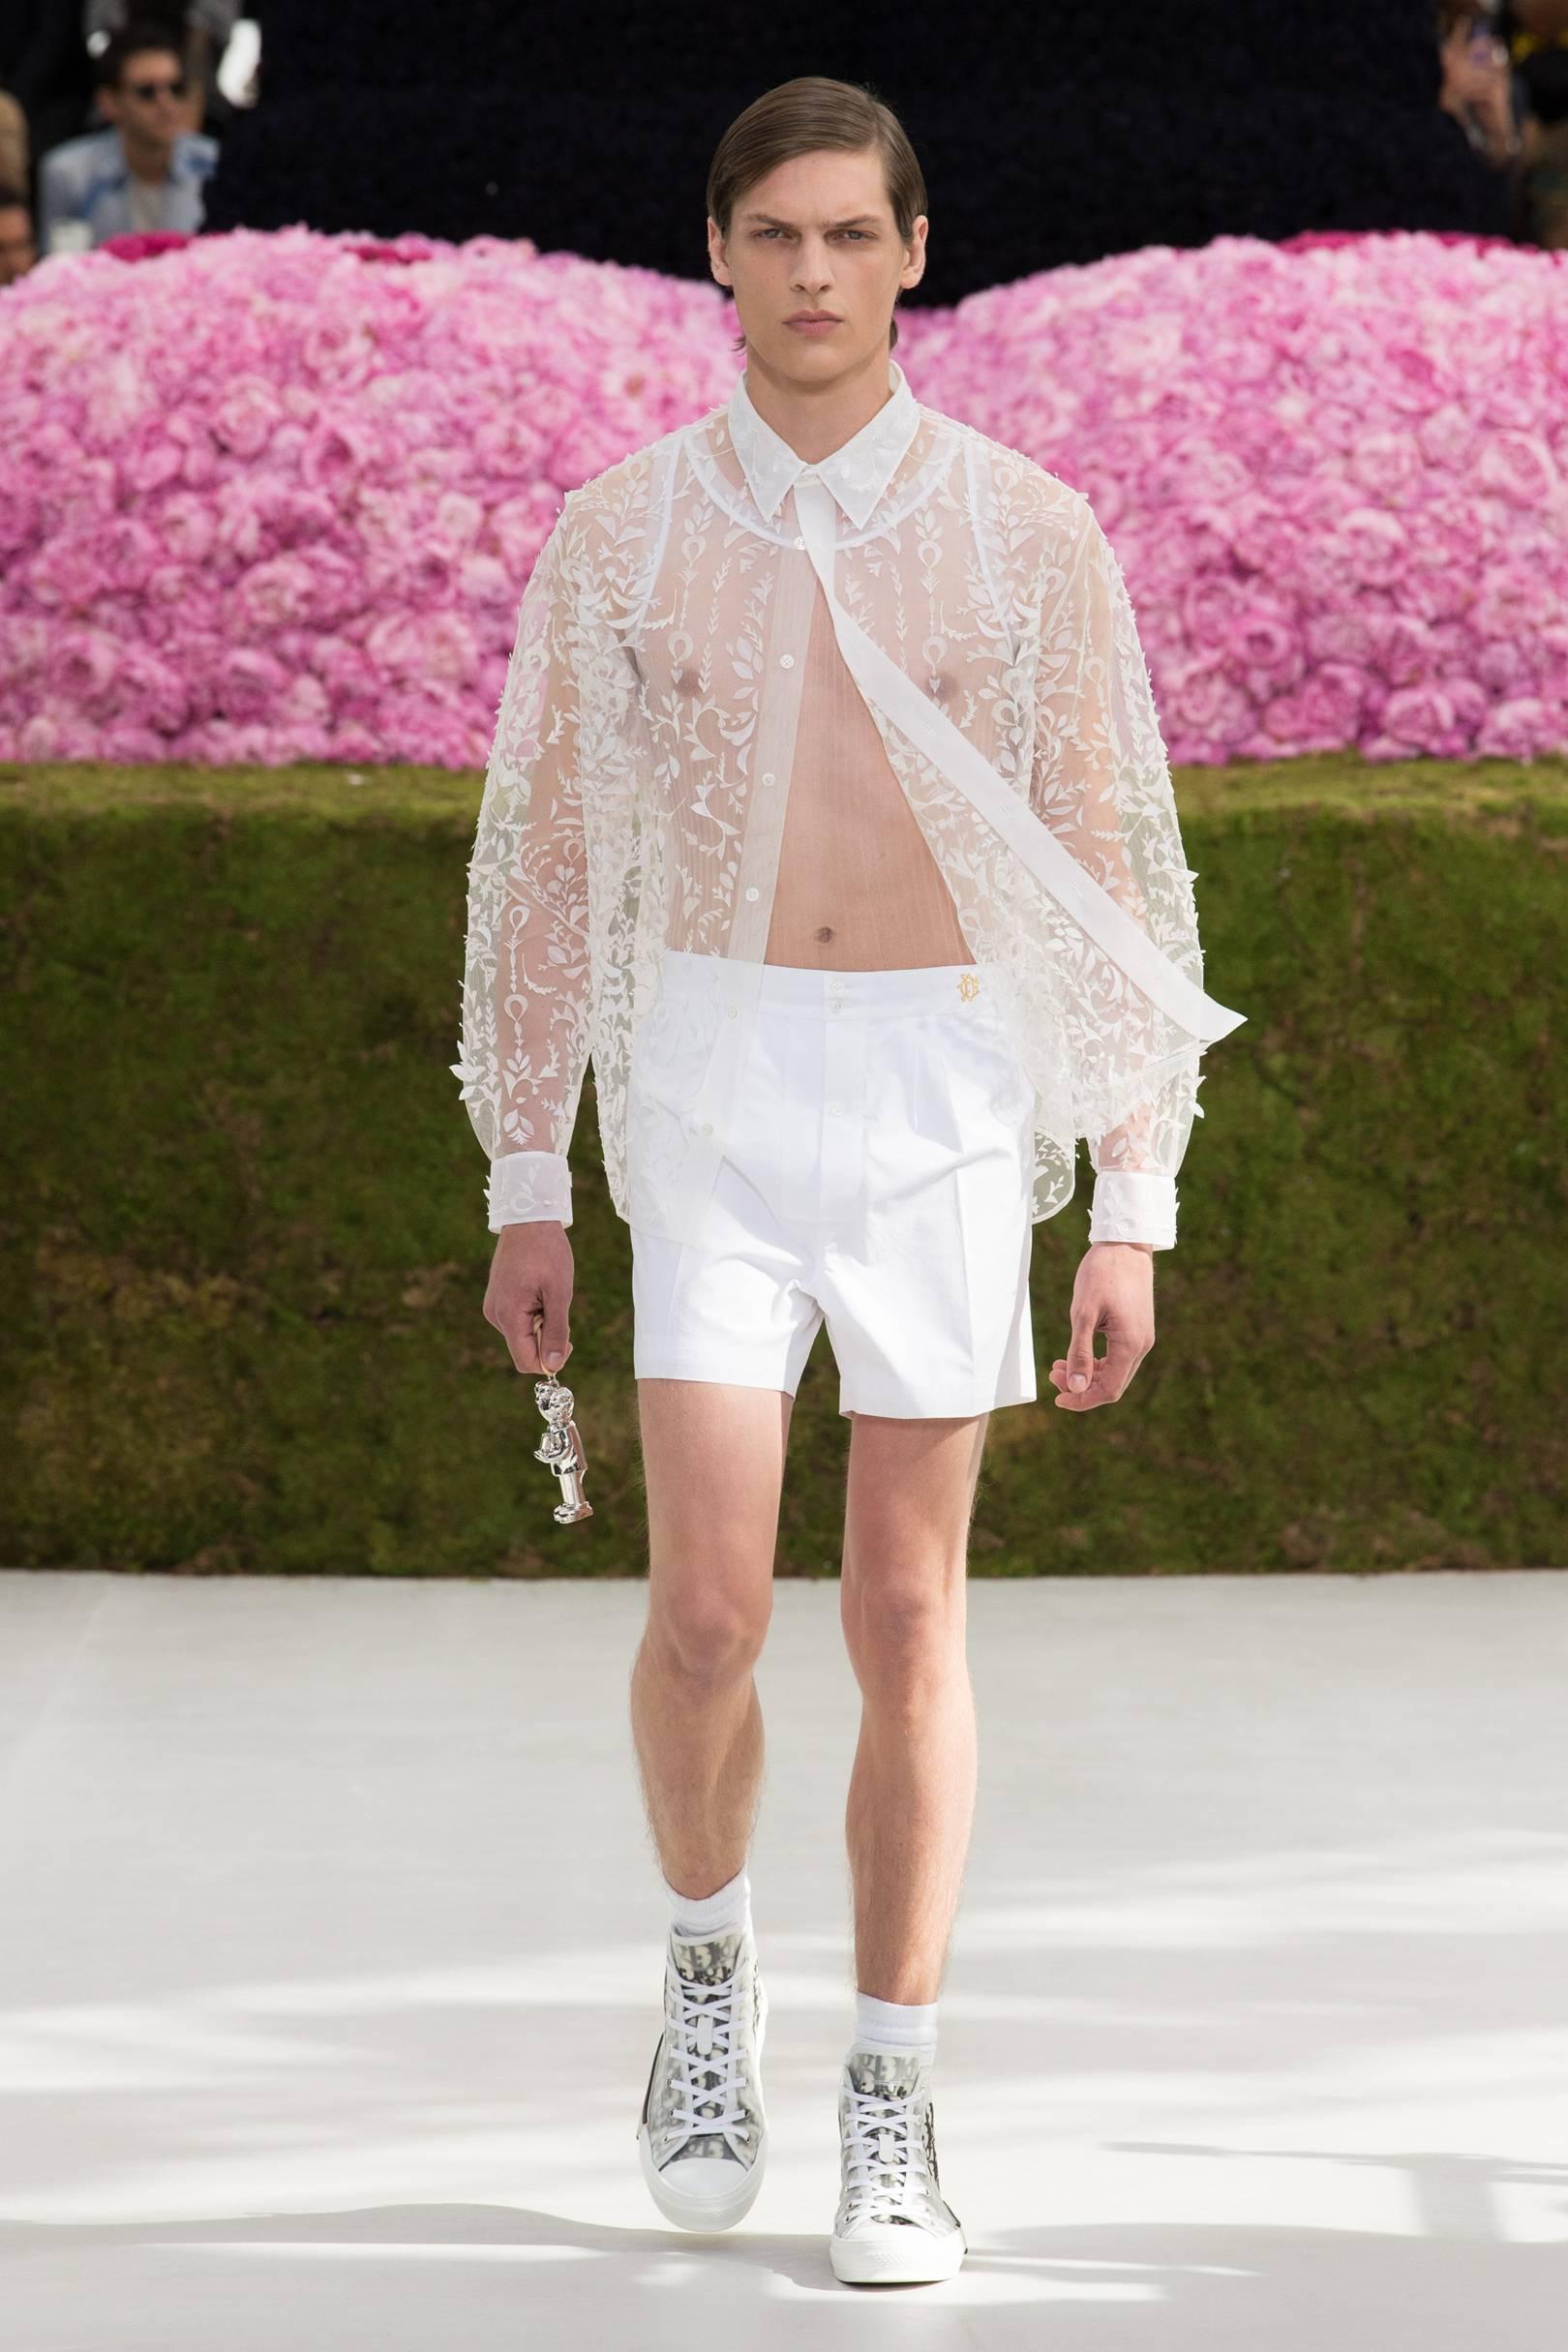 1dcb3d4eec0 Kim Jones interview: the new artistic director on his tenure at Dior |  British GQ